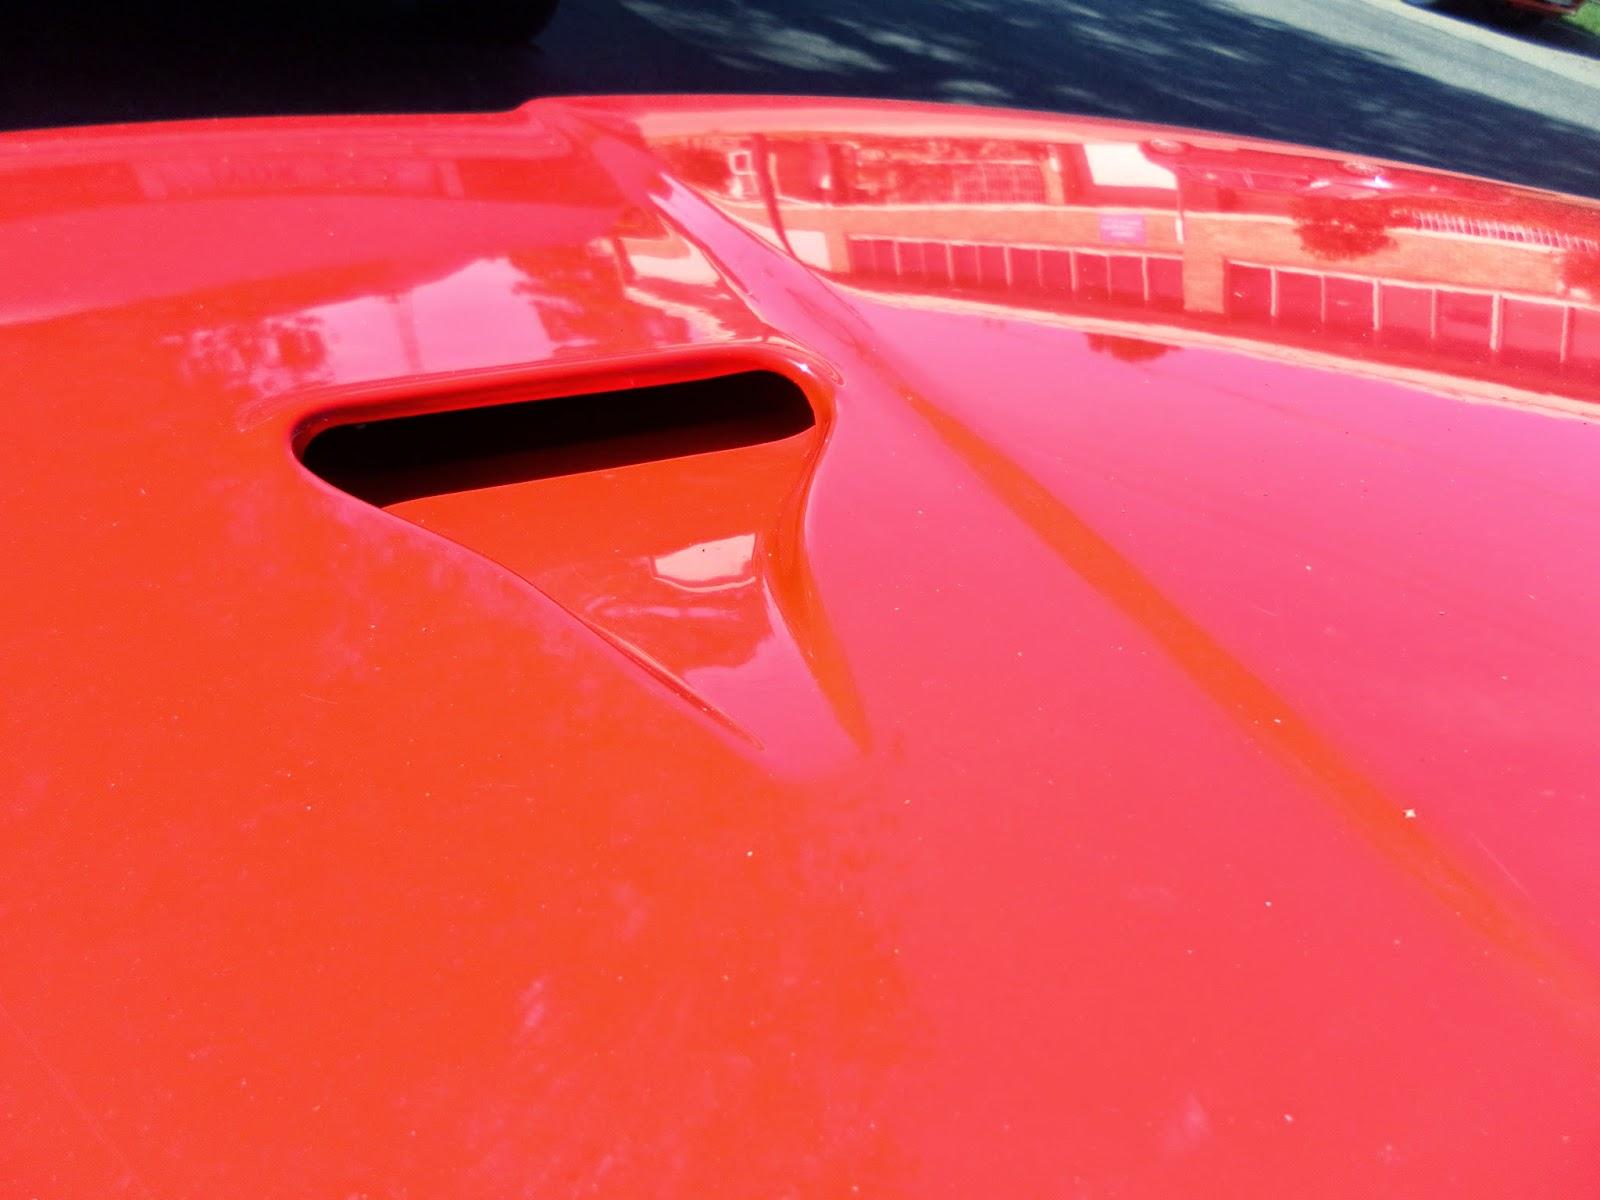 Aussie Old Parked Cars: 1990 Maserati Karif